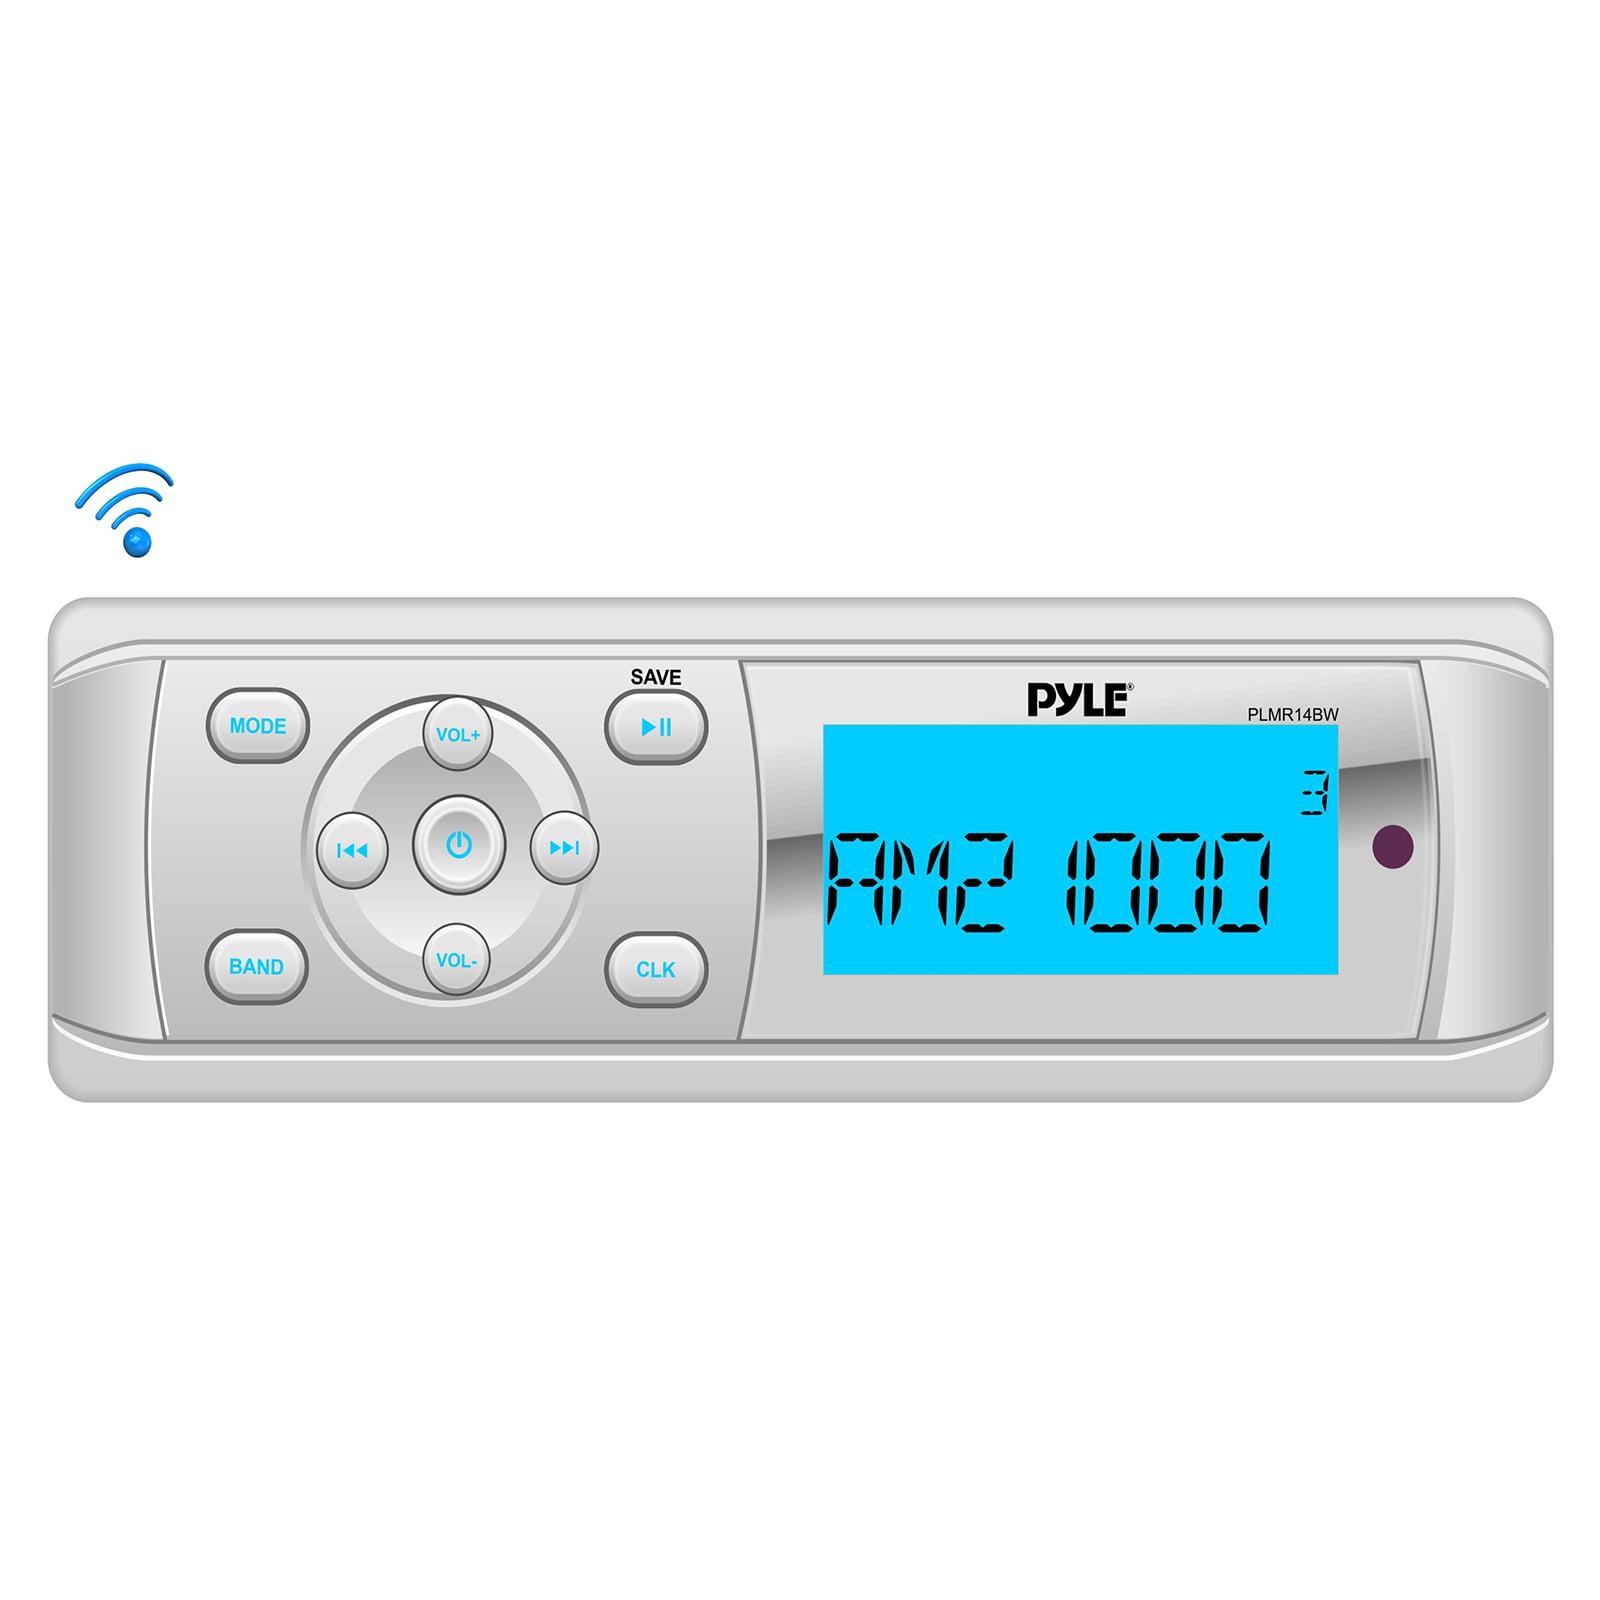 Car Audio Universal BT Marine Stereo Radio Receiver, Water-Resistant/Weatherproof, MP3/USB Reader, AM/FM Radio, Weatherband + Pyle en VeoyCompro.net